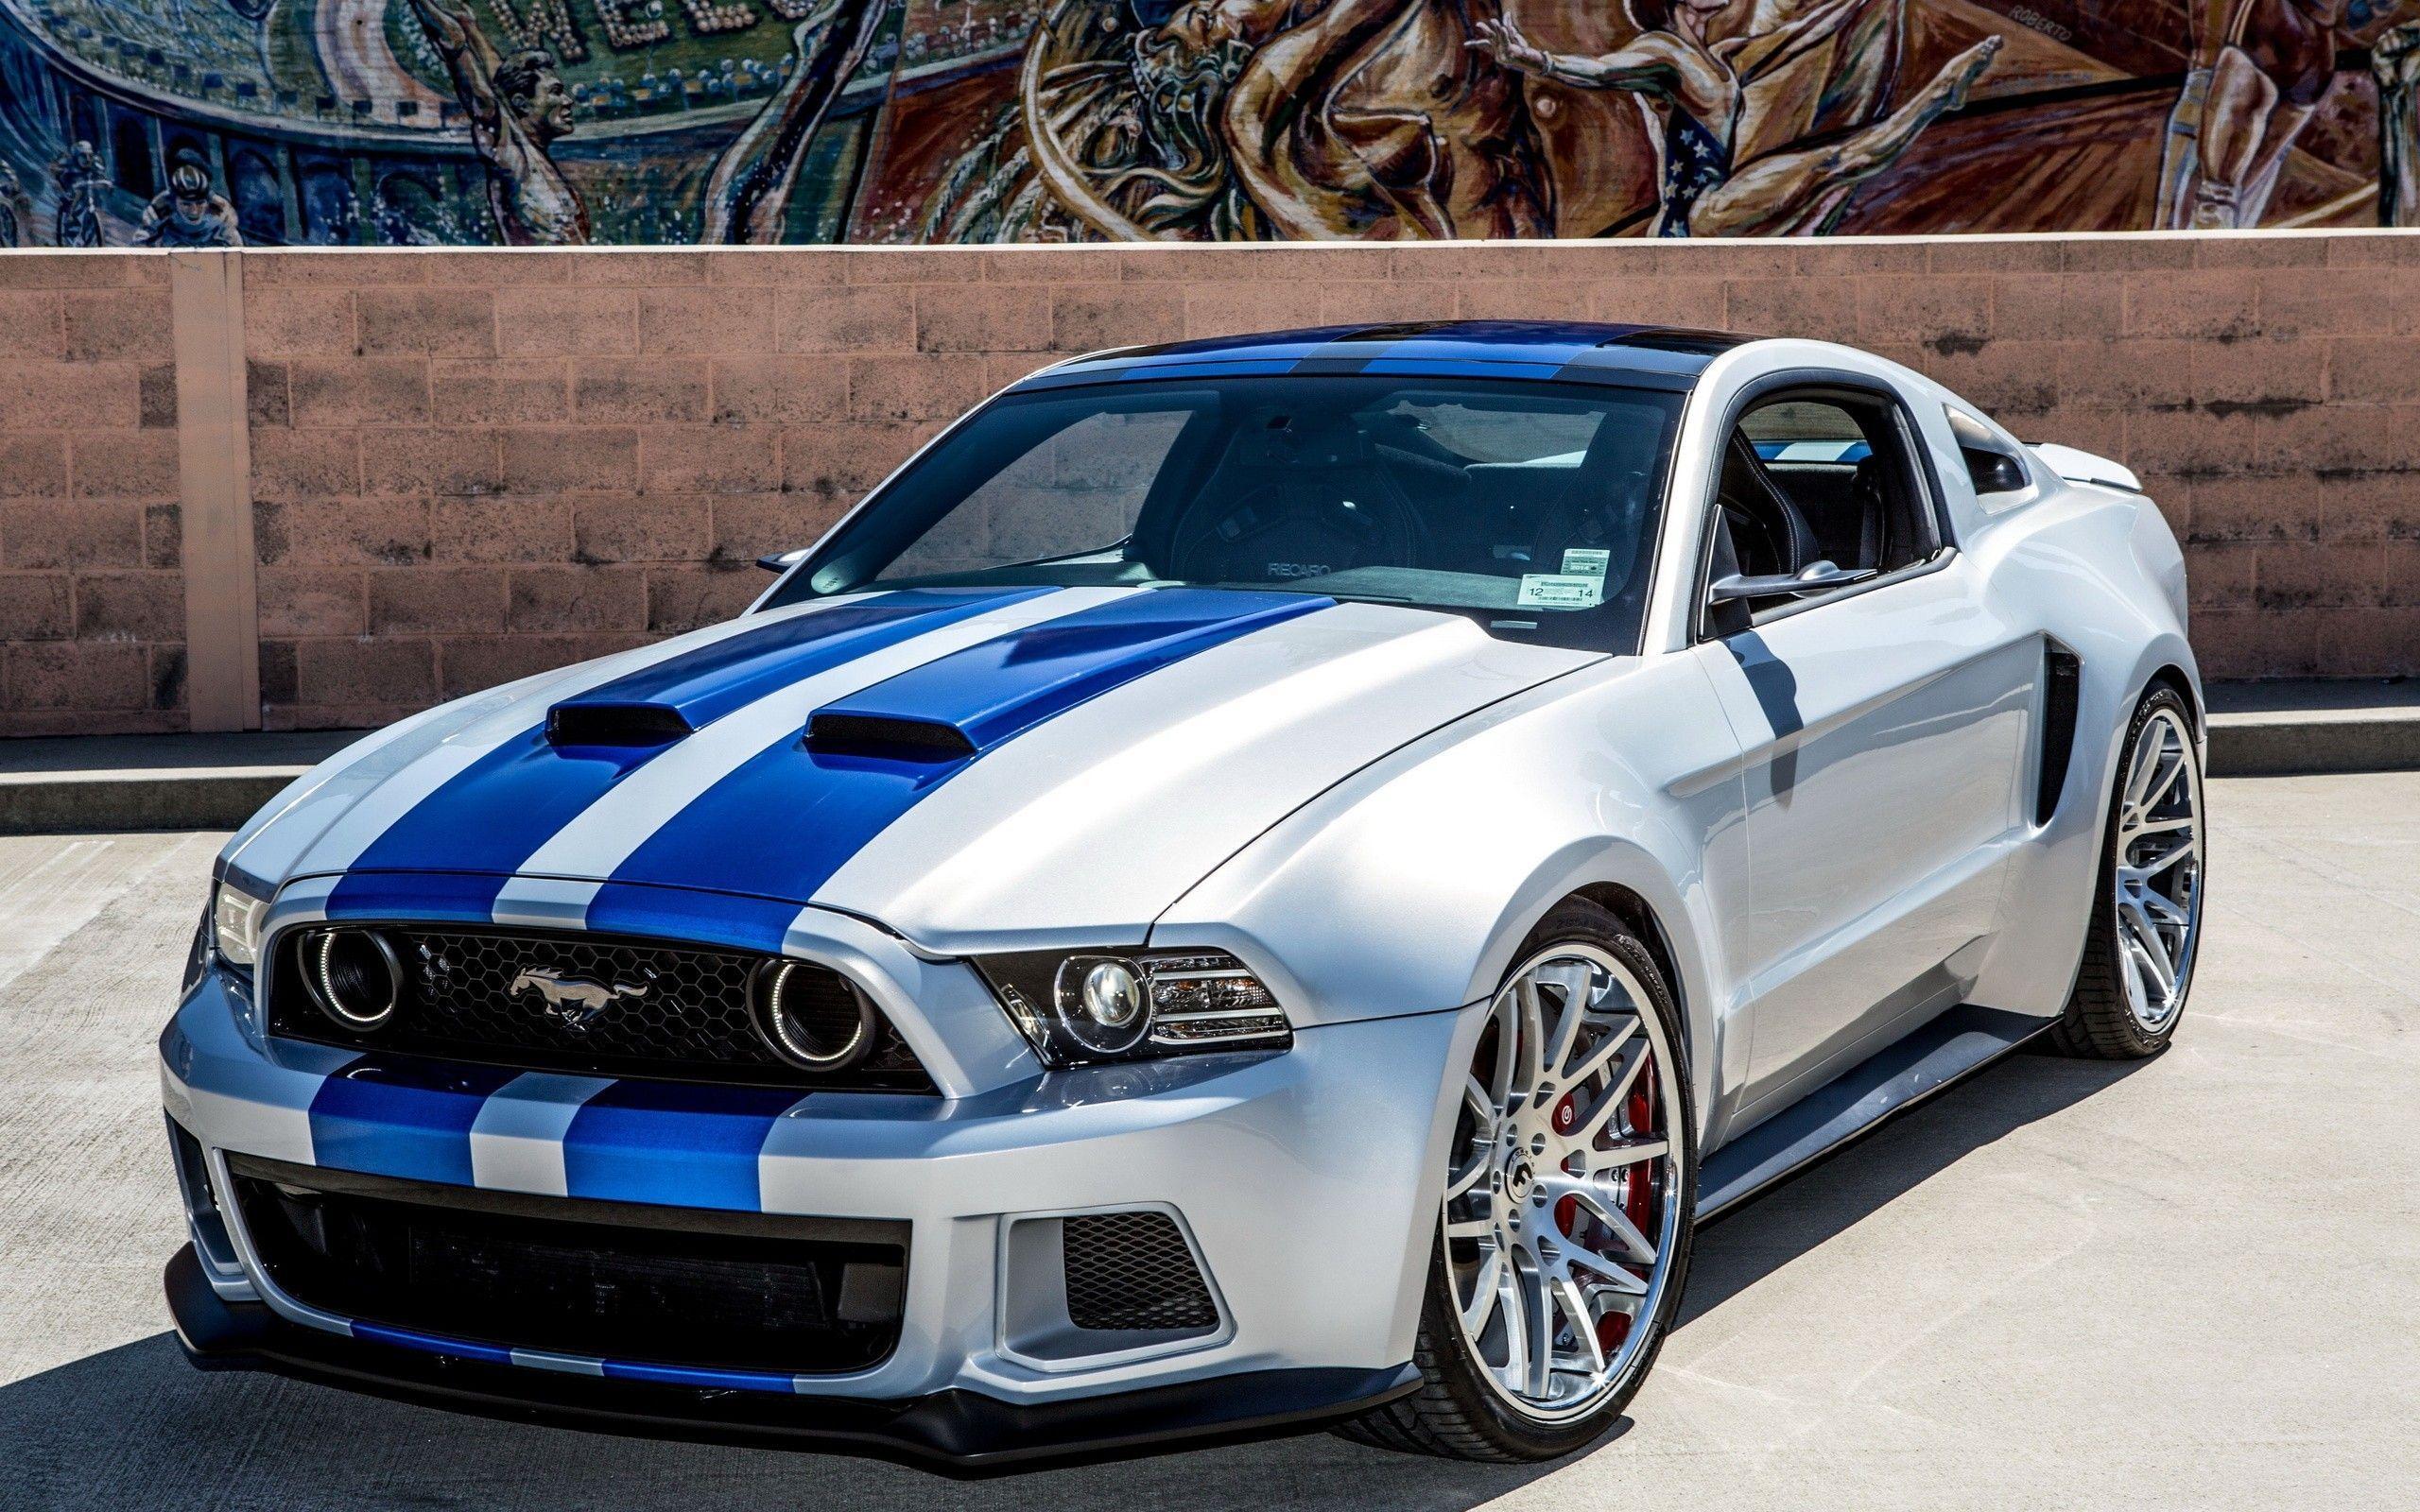 Mustang Car Hd Wallpapers Top Free Mustang Car Hd Backgrounds